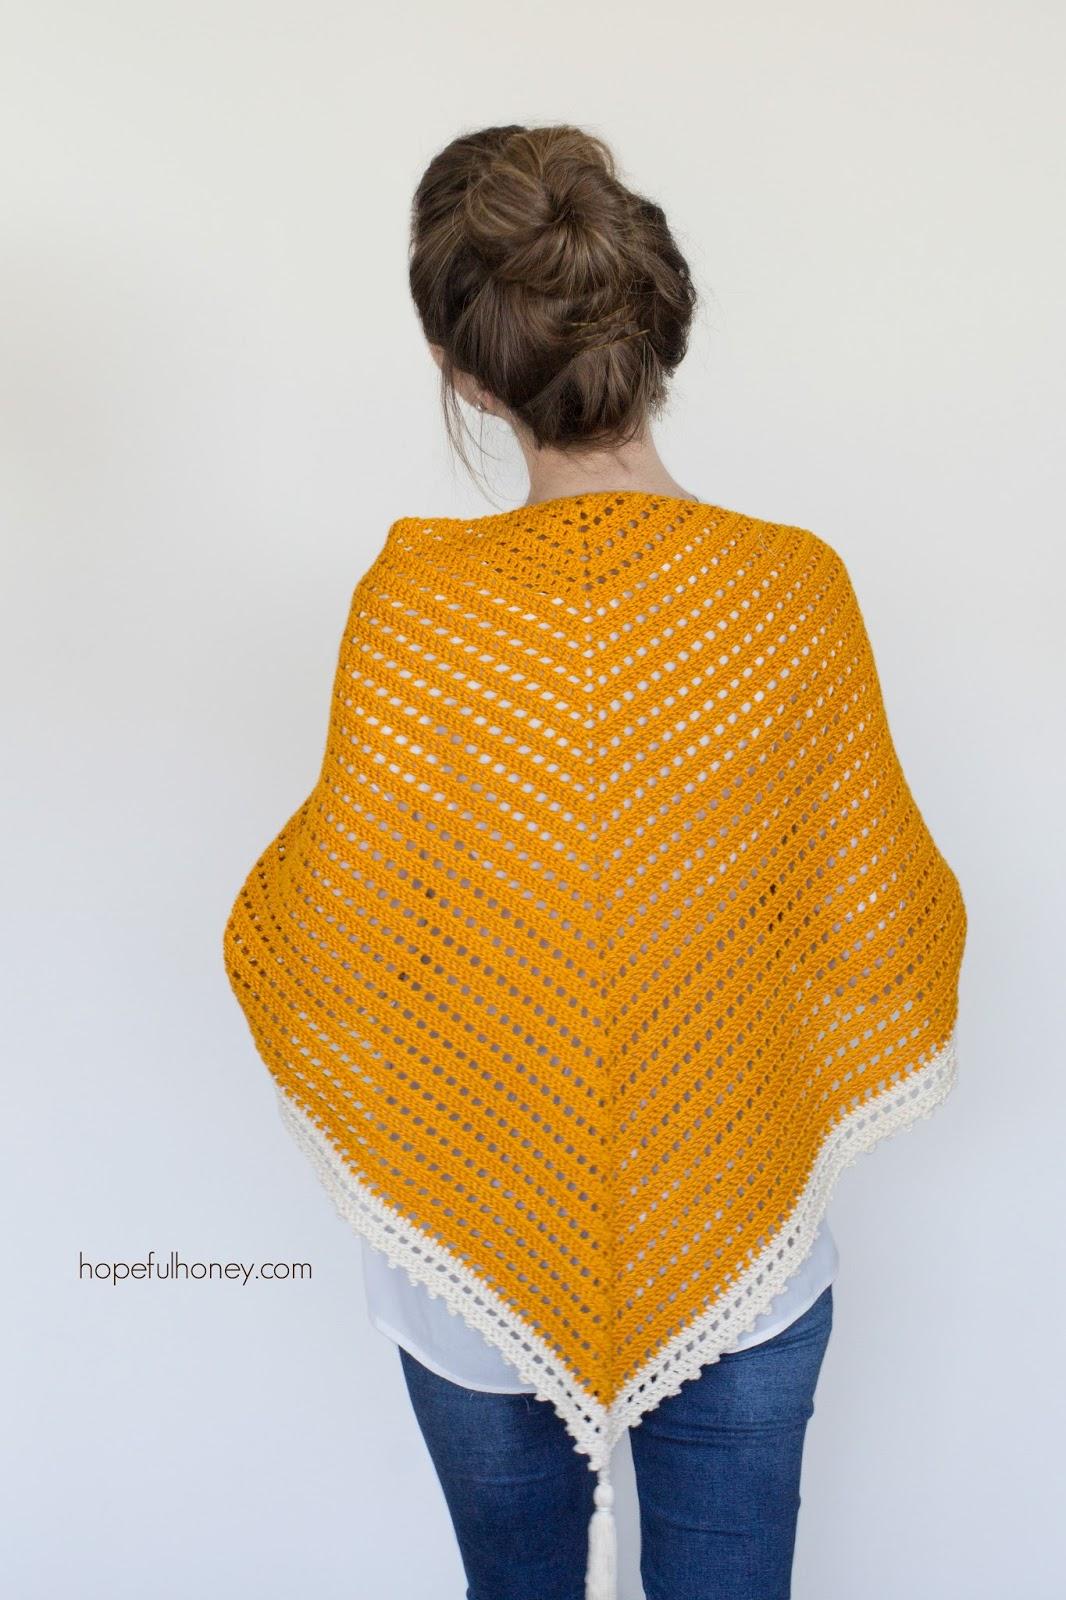 Crochet Pattern Triangle Scarf : Hopeful Honey Craft, Crochet, Create: Honey Bird ...